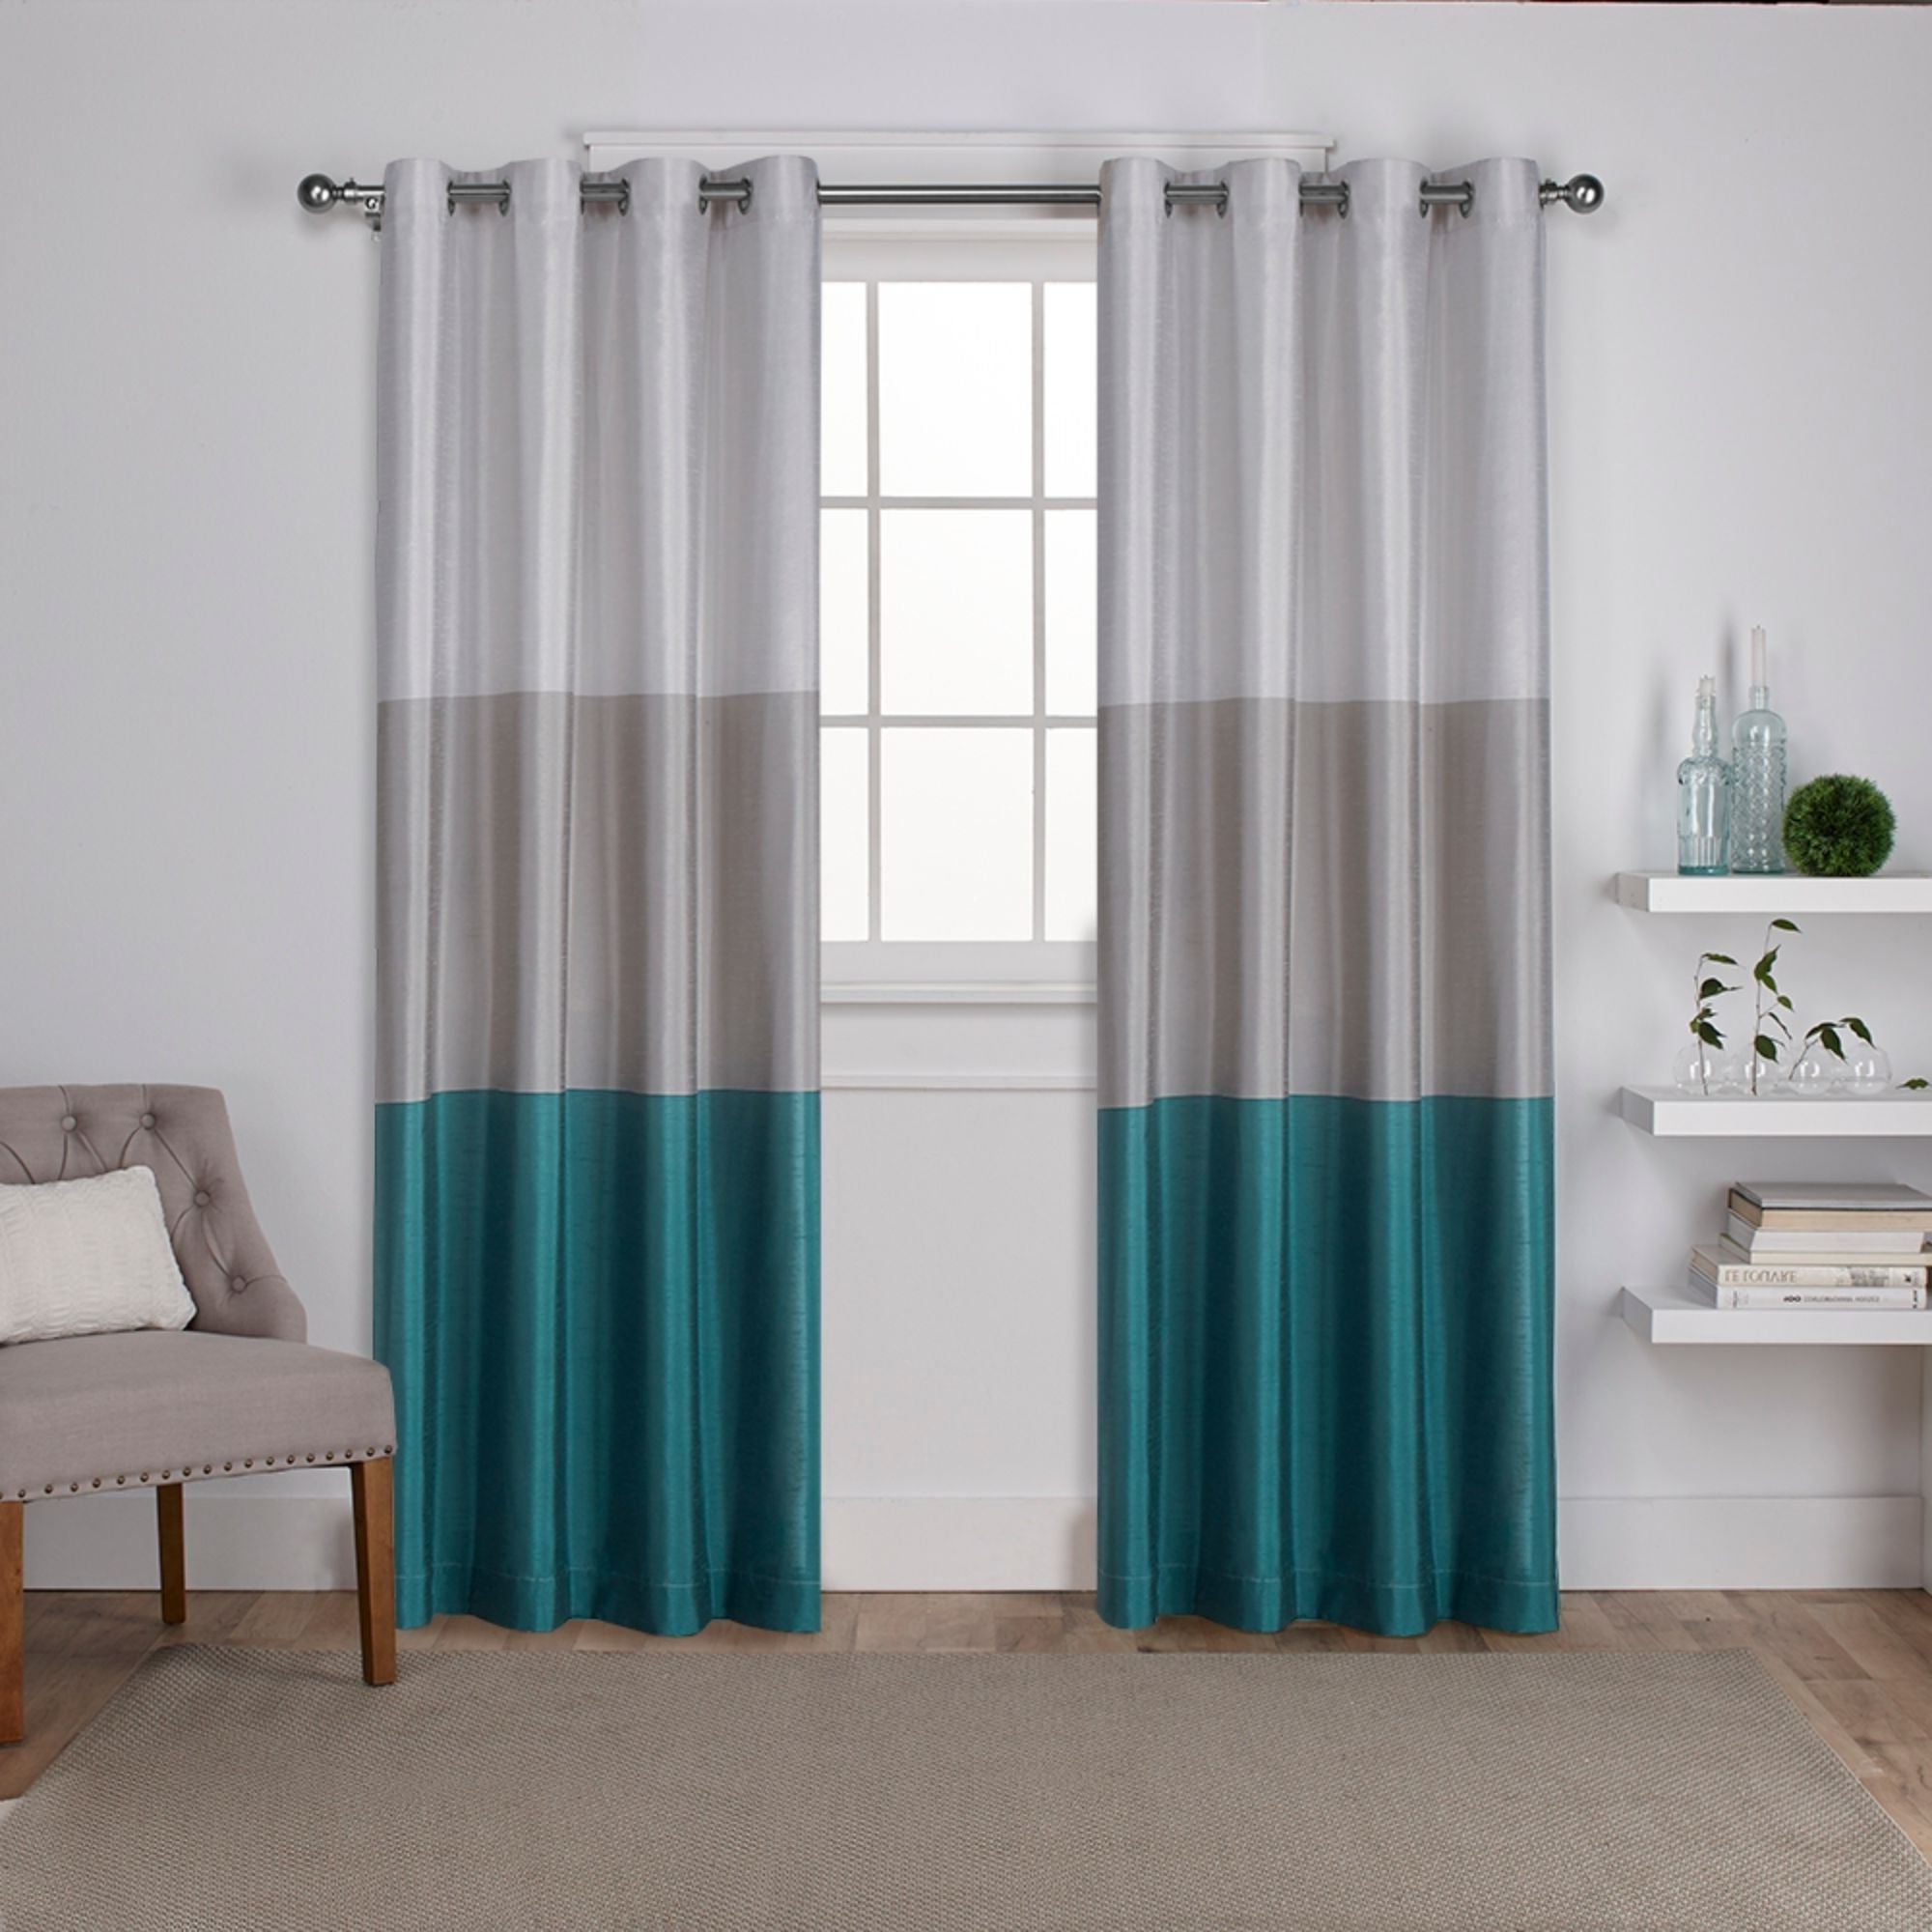 Most Popular Porch & Den Ocean Striped Window Curtain Panel Pair With Grommet Top In Ocean Striped Window Curtain Panel Pairs With Grommet Top (Gallery 3 of 20)